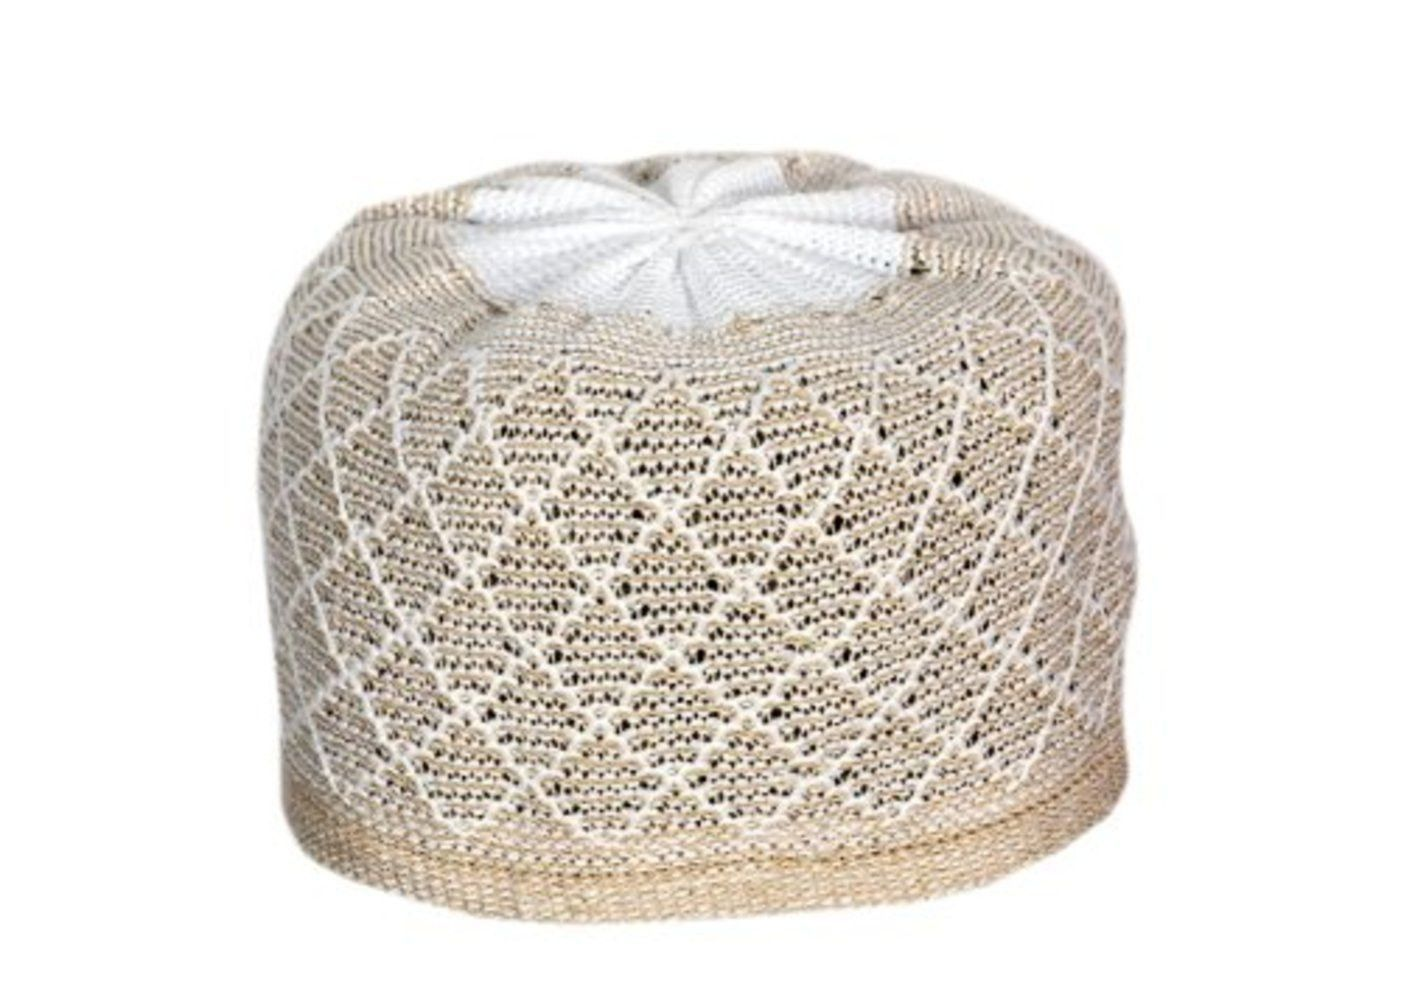 Muslim Prayer Cap Kufi Topi Soft Threads & Block Shaped (Gray ...